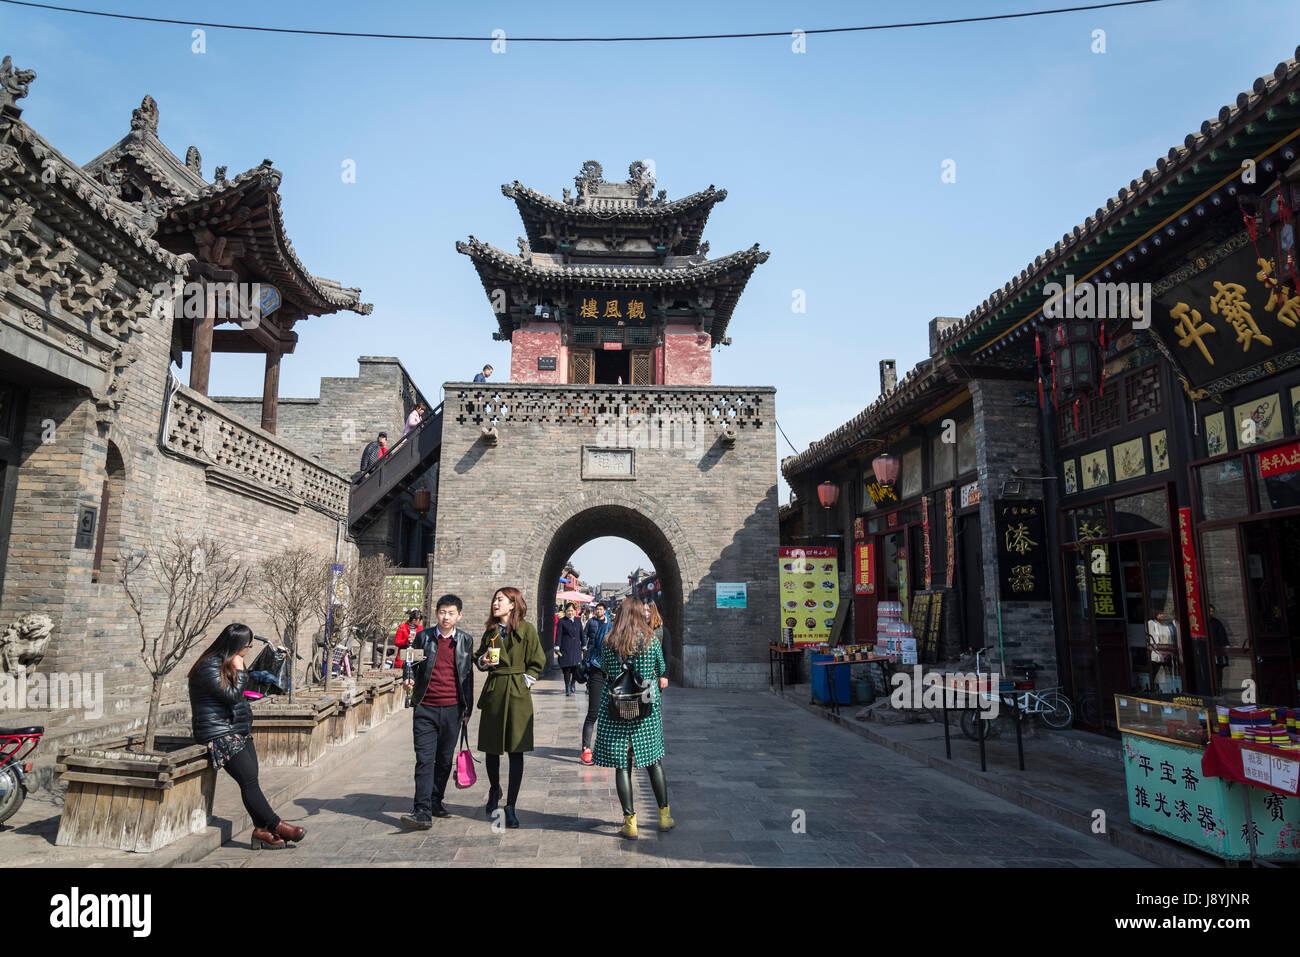 Fengshui torre di guardia, di Pingyao, nella provincia di Shanxi, Cina Immagini Stock